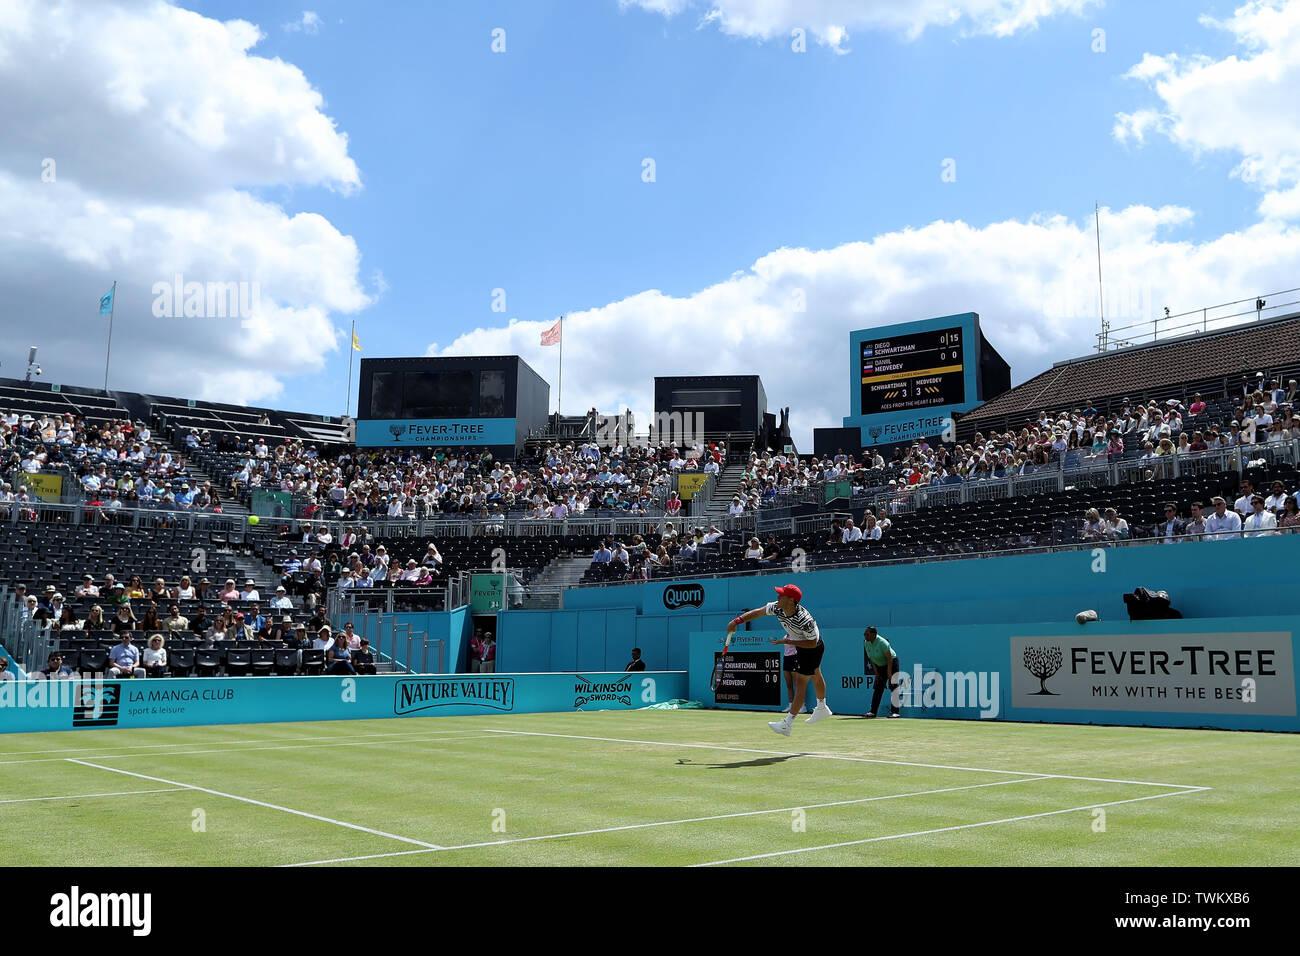 Queen Club, London, UK. 21st June, 2019. The ATP Fever-Tree Tennis Tournament; Diego Schwartzman (ARG) serves to Daniil Medvedev (RUS) Credit: Action Plus Sports/Alamy Live News Stock Photo